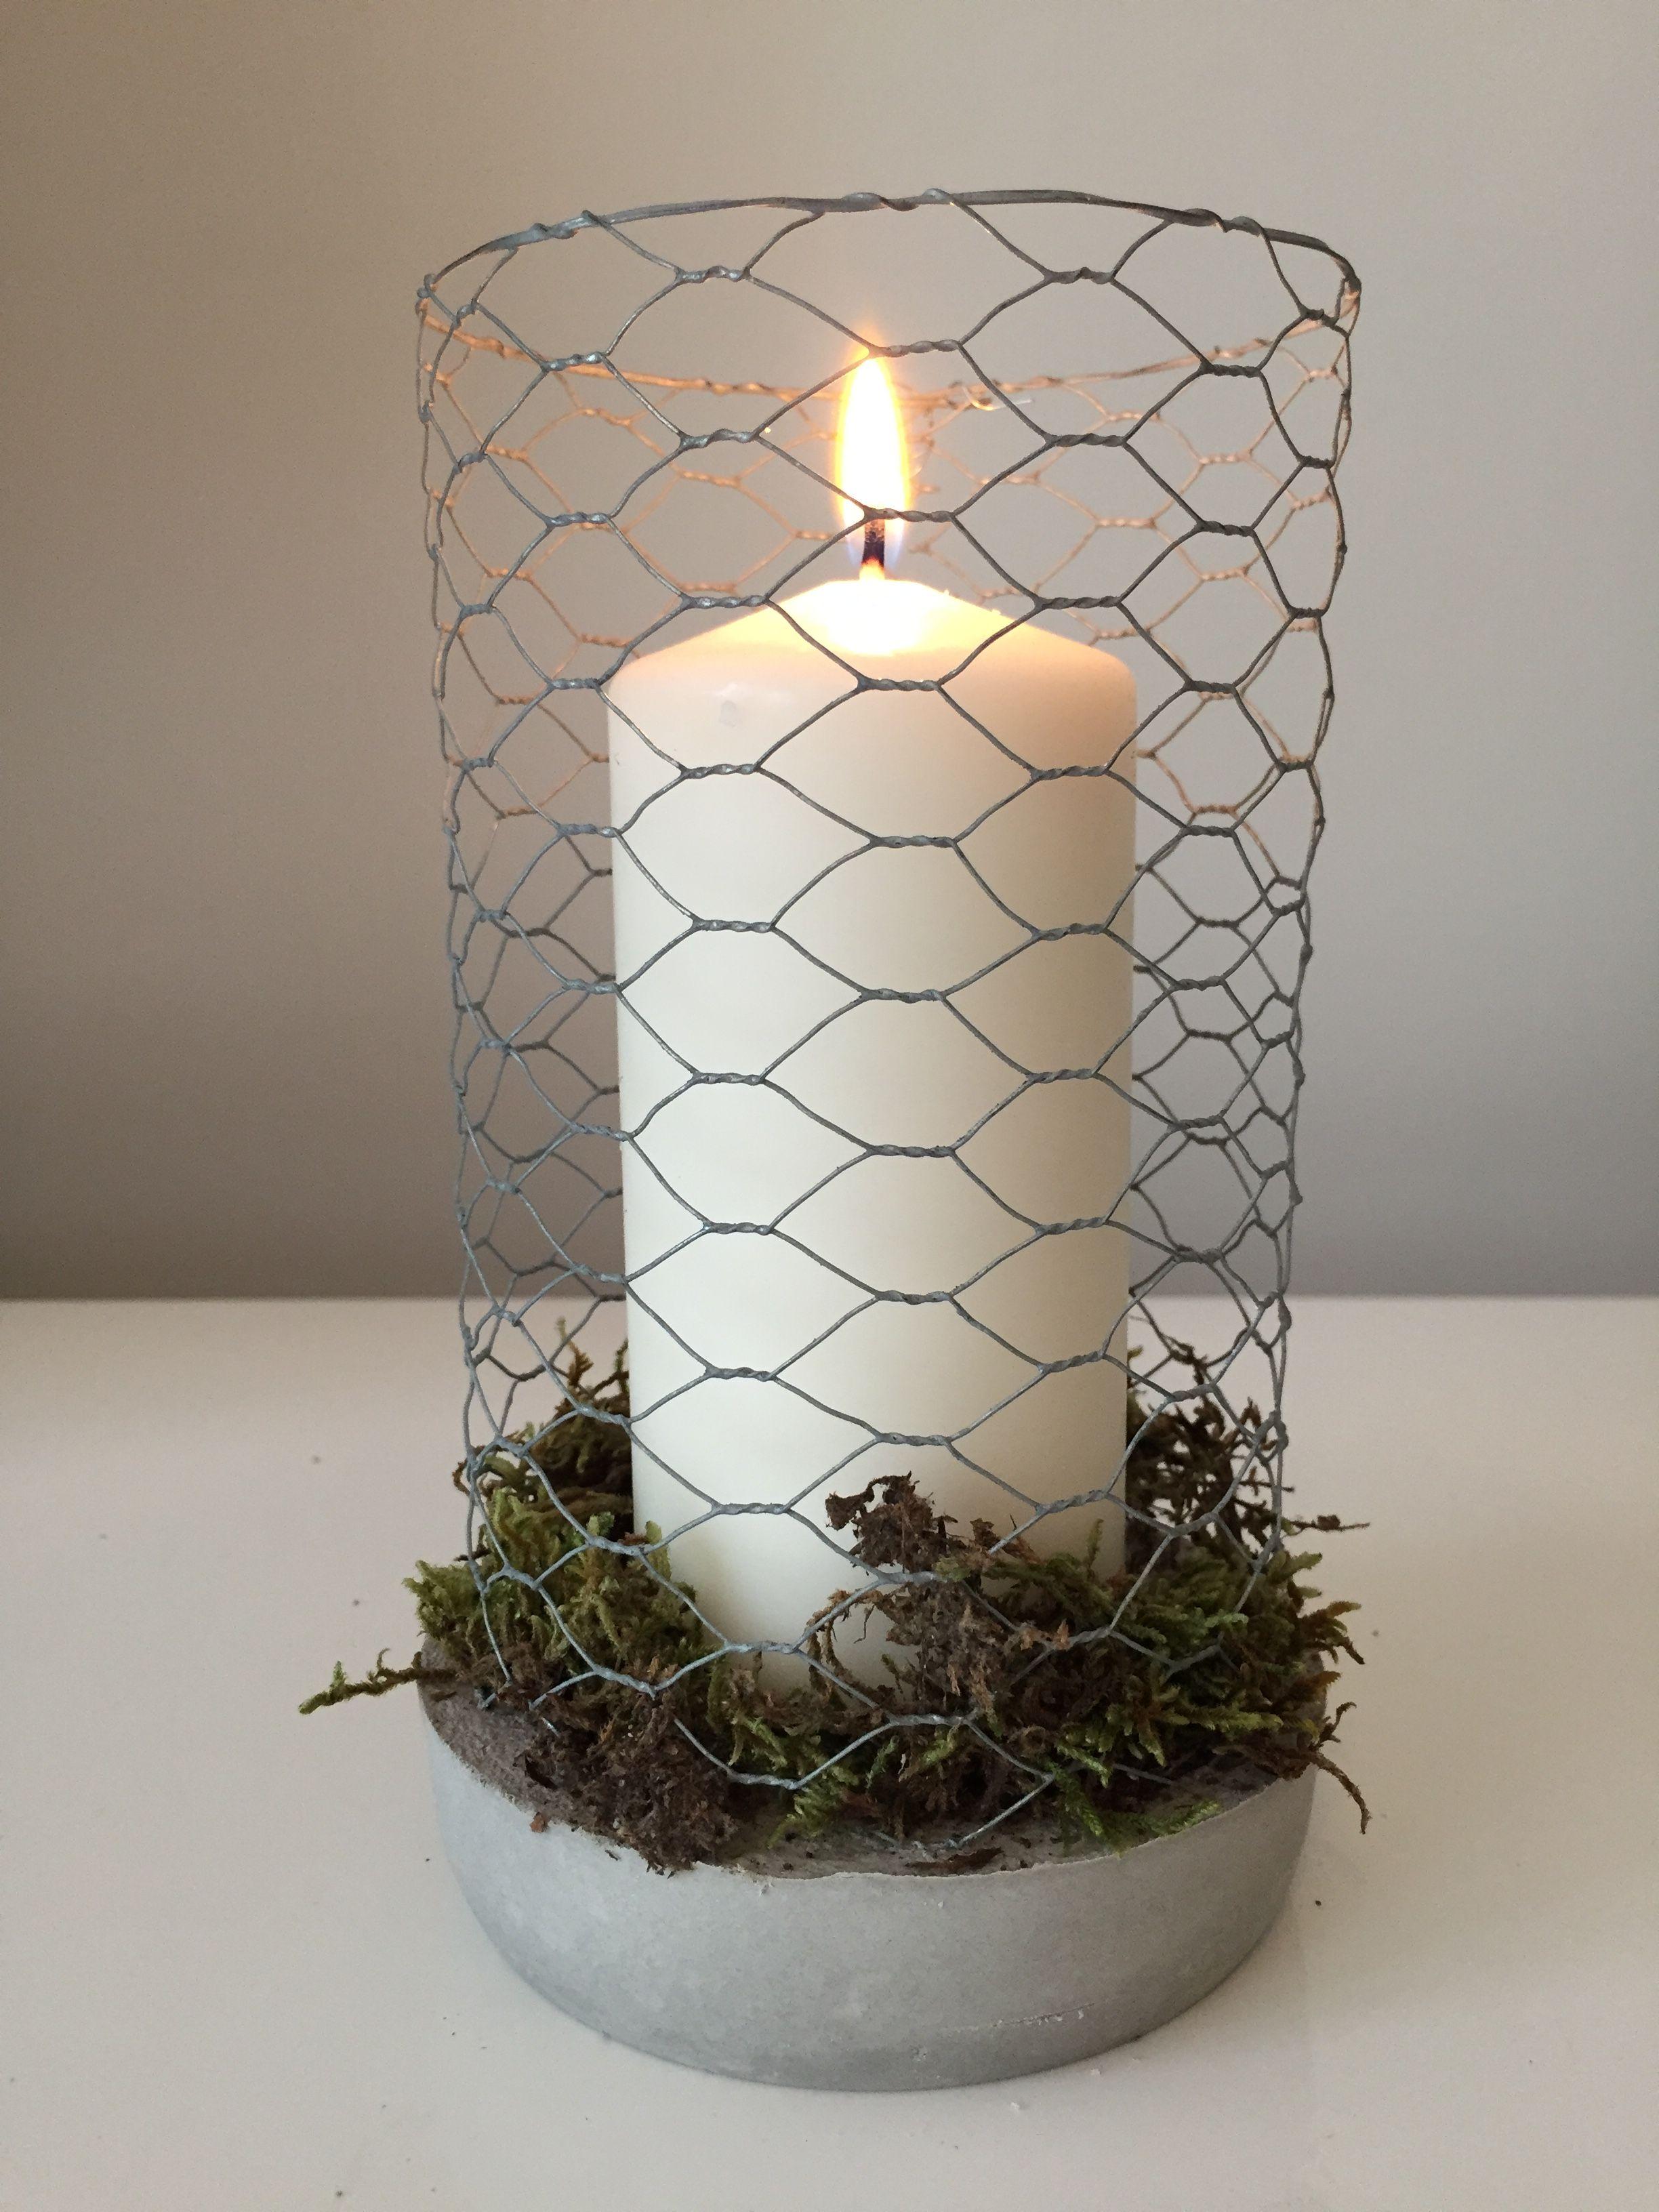 diy kerzenhalter aus kaninchendraht in beton mit getrocknetem moos candles pinterest. Black Bedroom Furniture Sets. Home Design Ideas